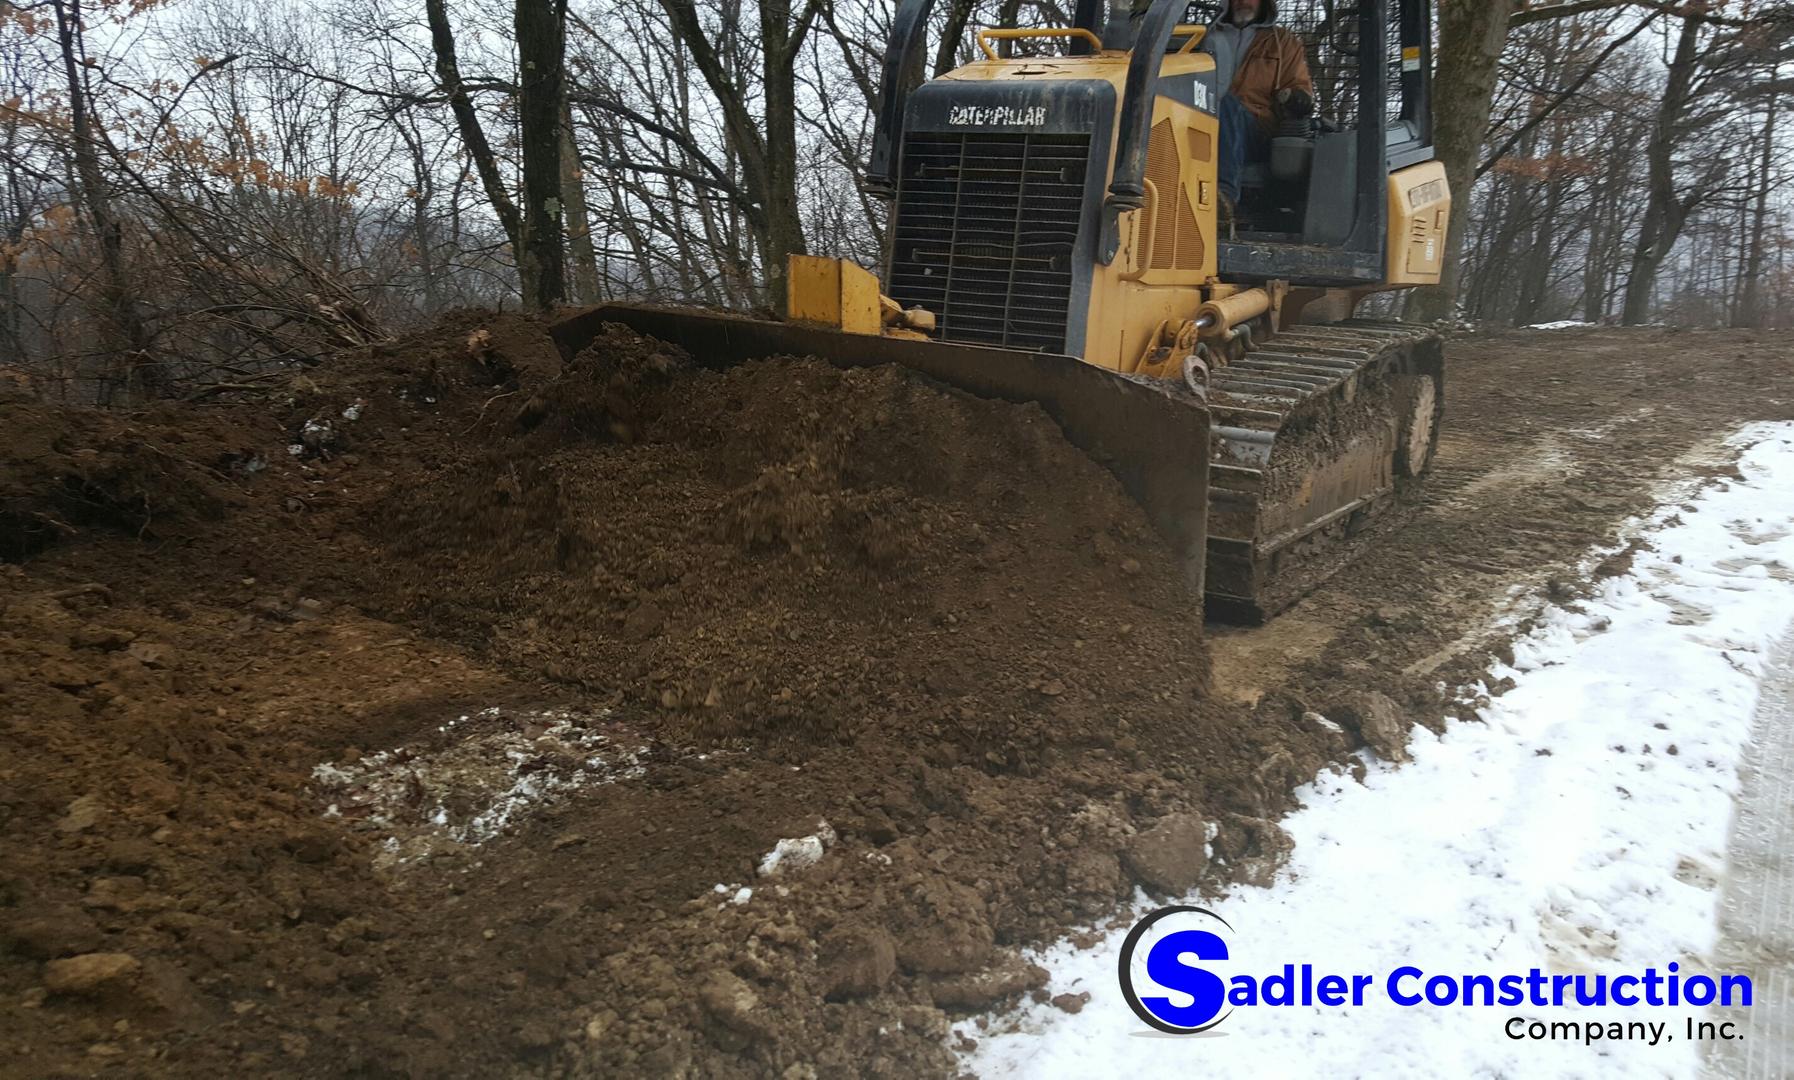 Sadler Construction Company, inc  : Services